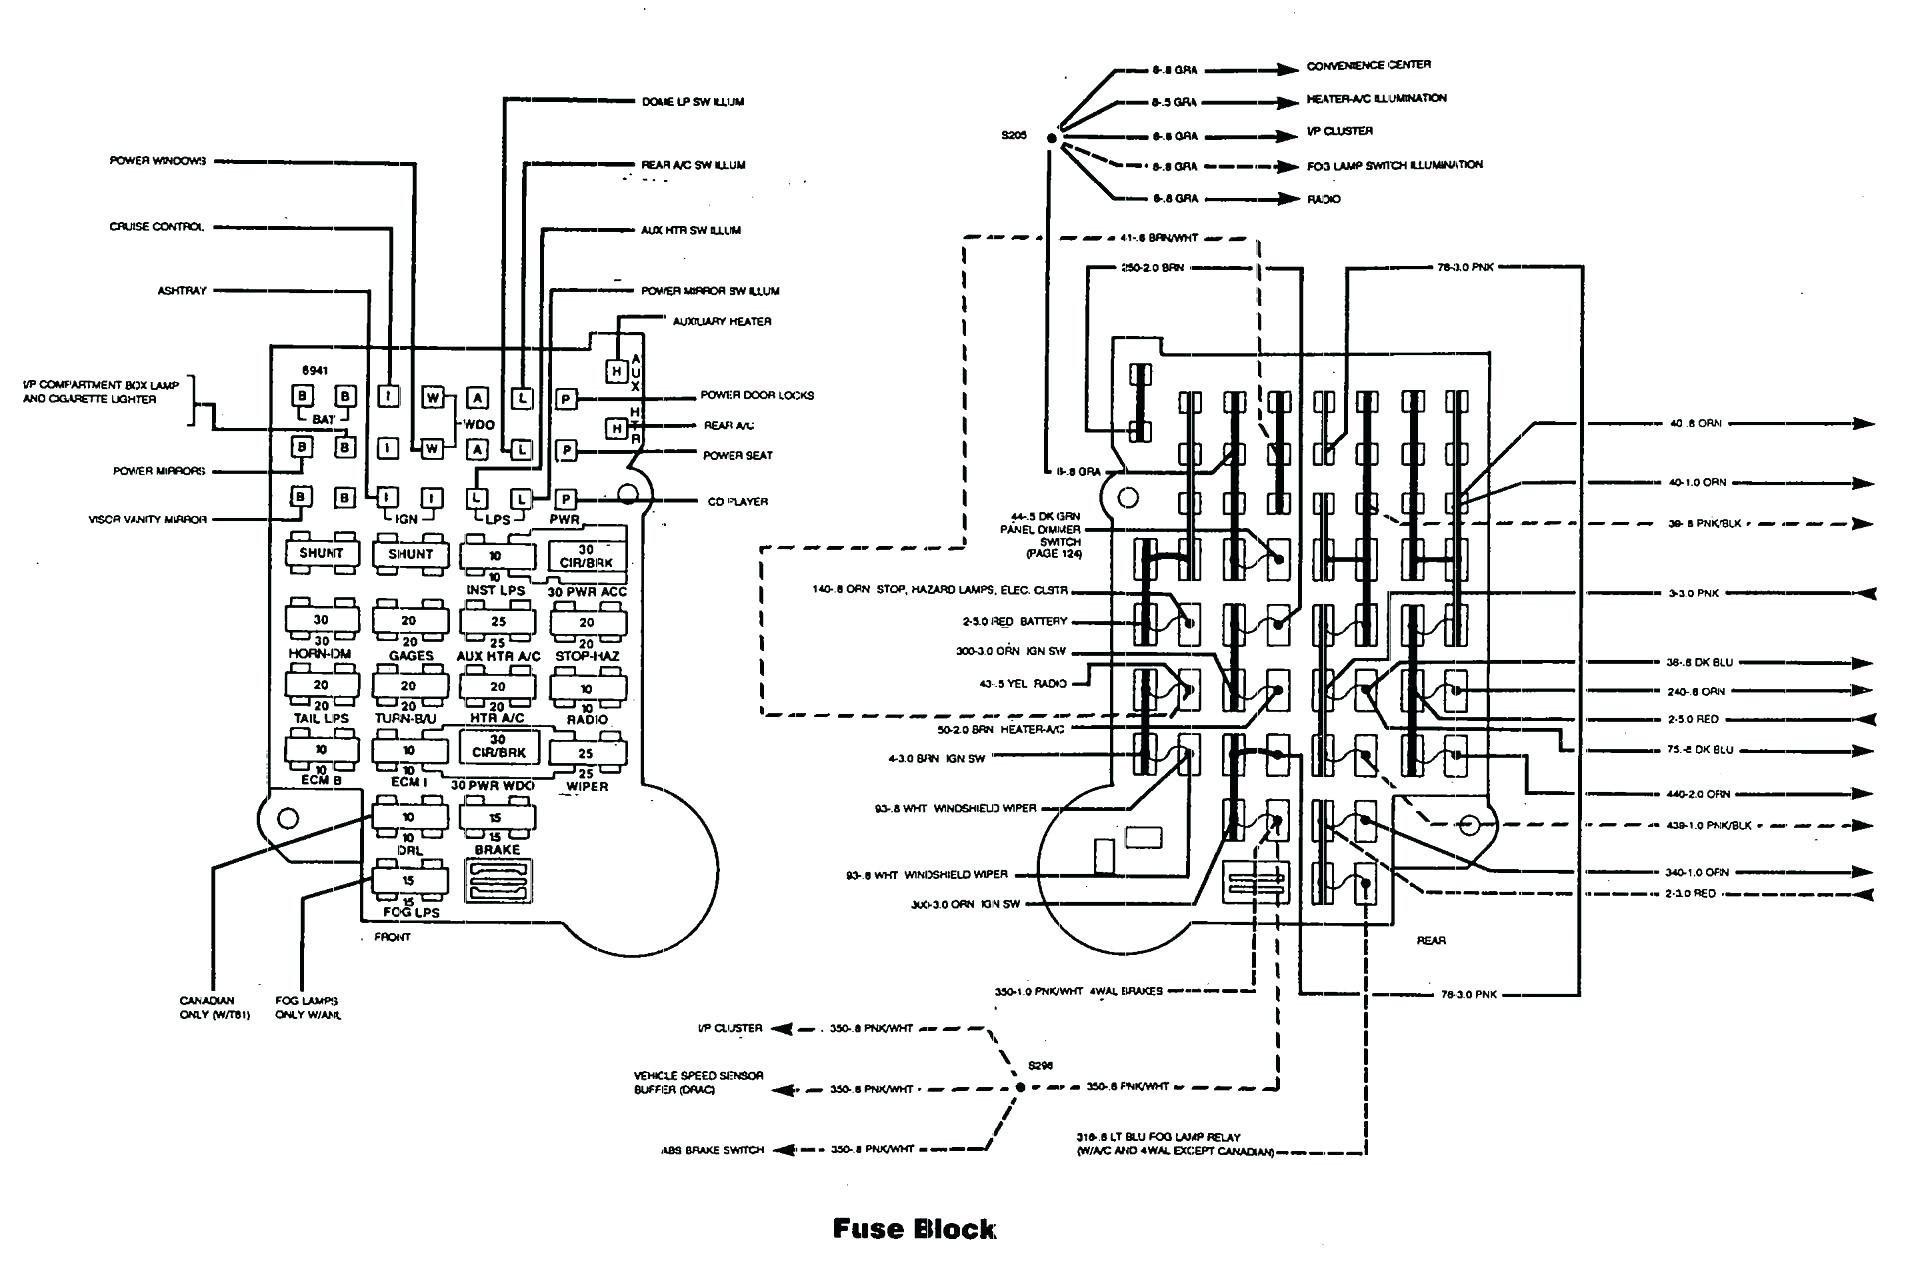 2002 Mercury Cougar Engine Diagram 2006 Mitsubishi Eclipse Engine Diagram Lzk Gallery Wiring Diagram Of 2002 Mercury Cougar Engine Diagram